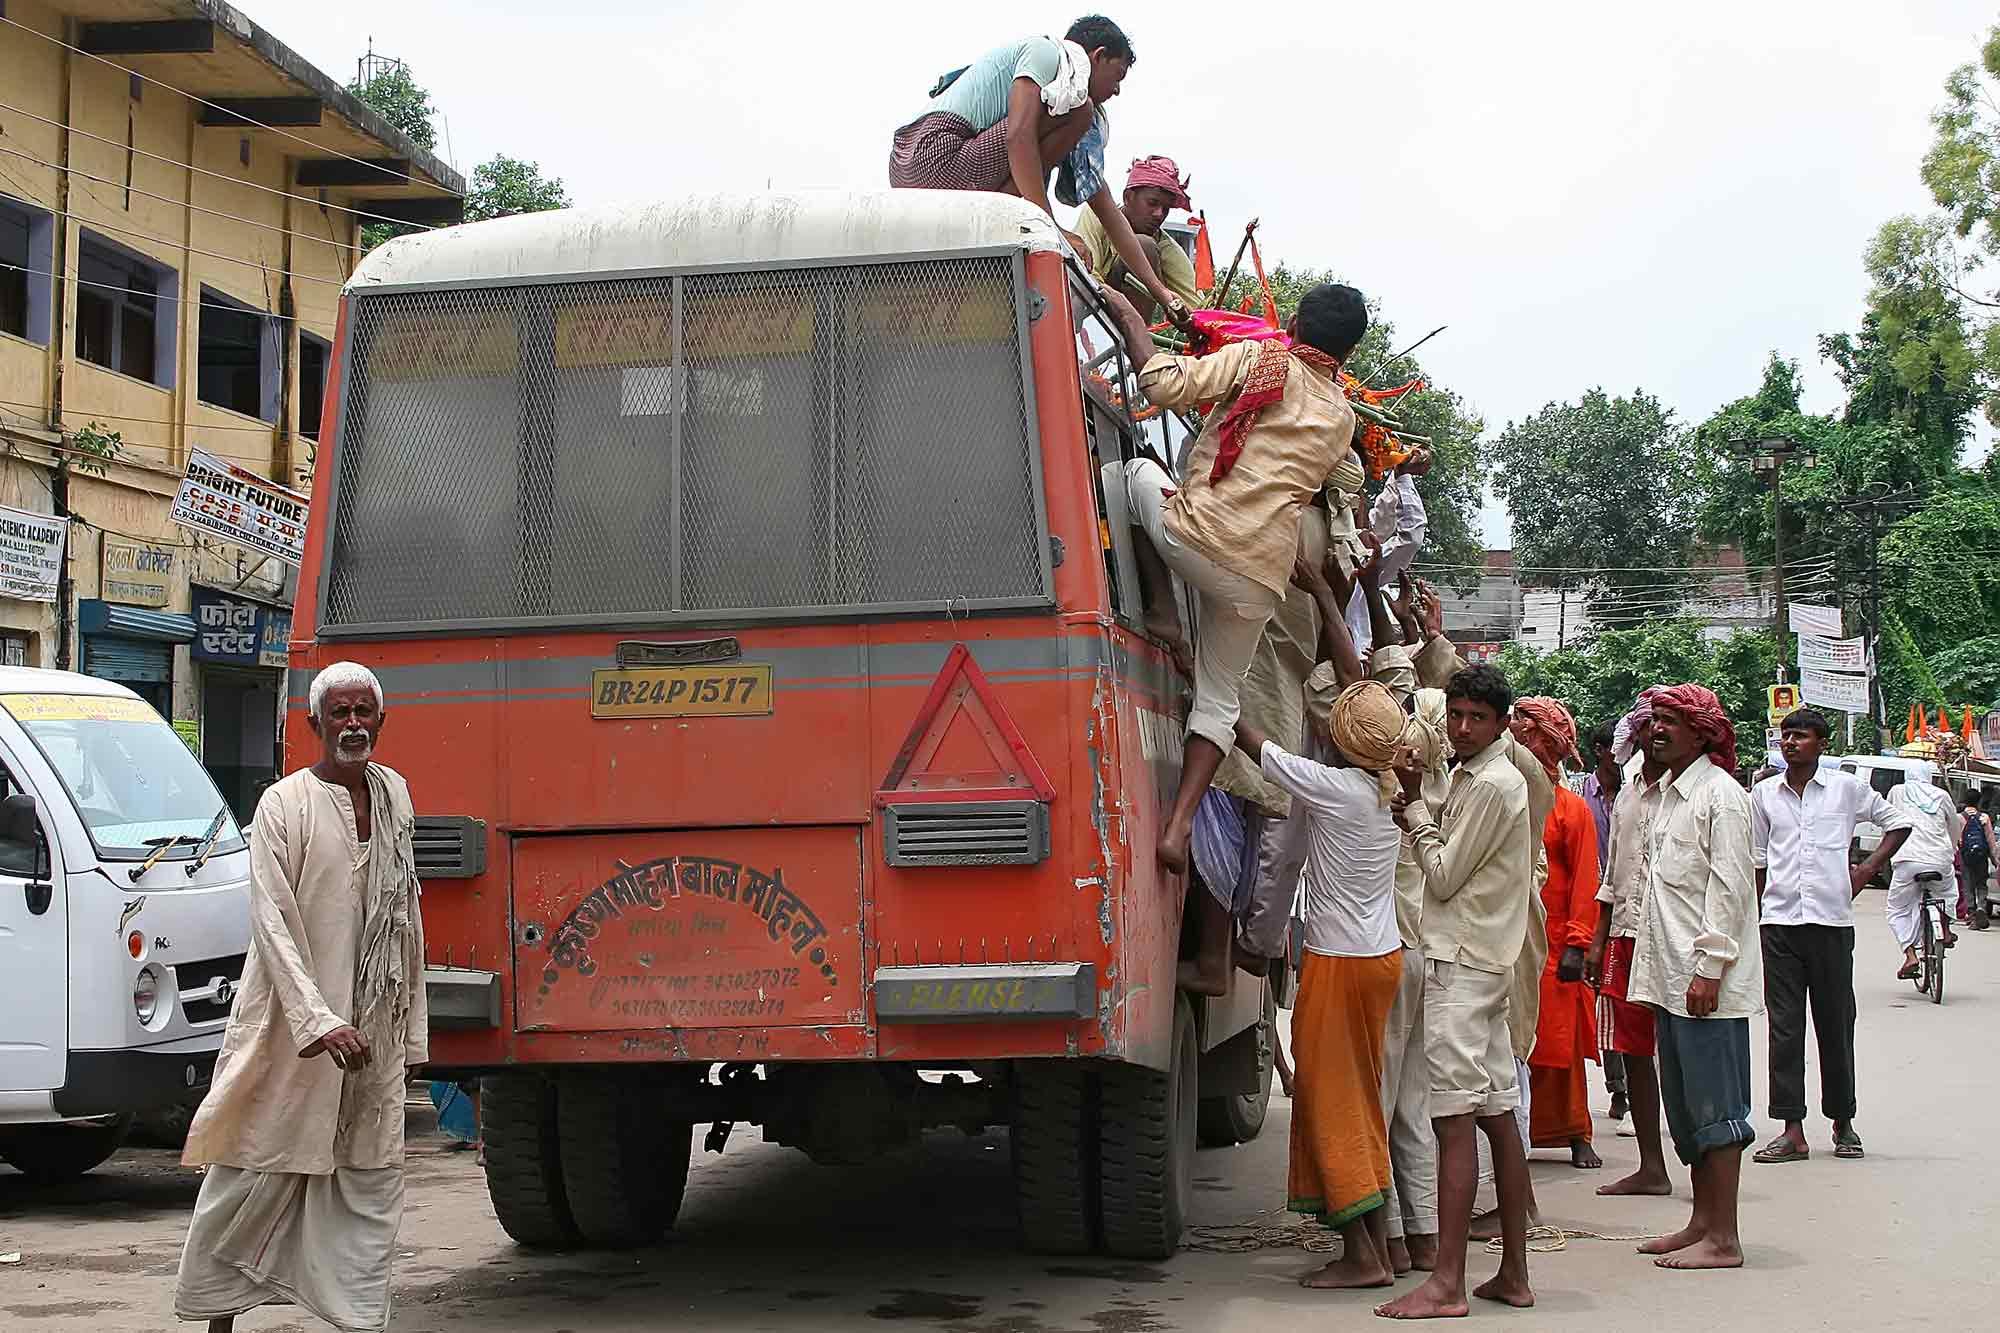 loading-bus-with-dead-human-body-varanasi-india